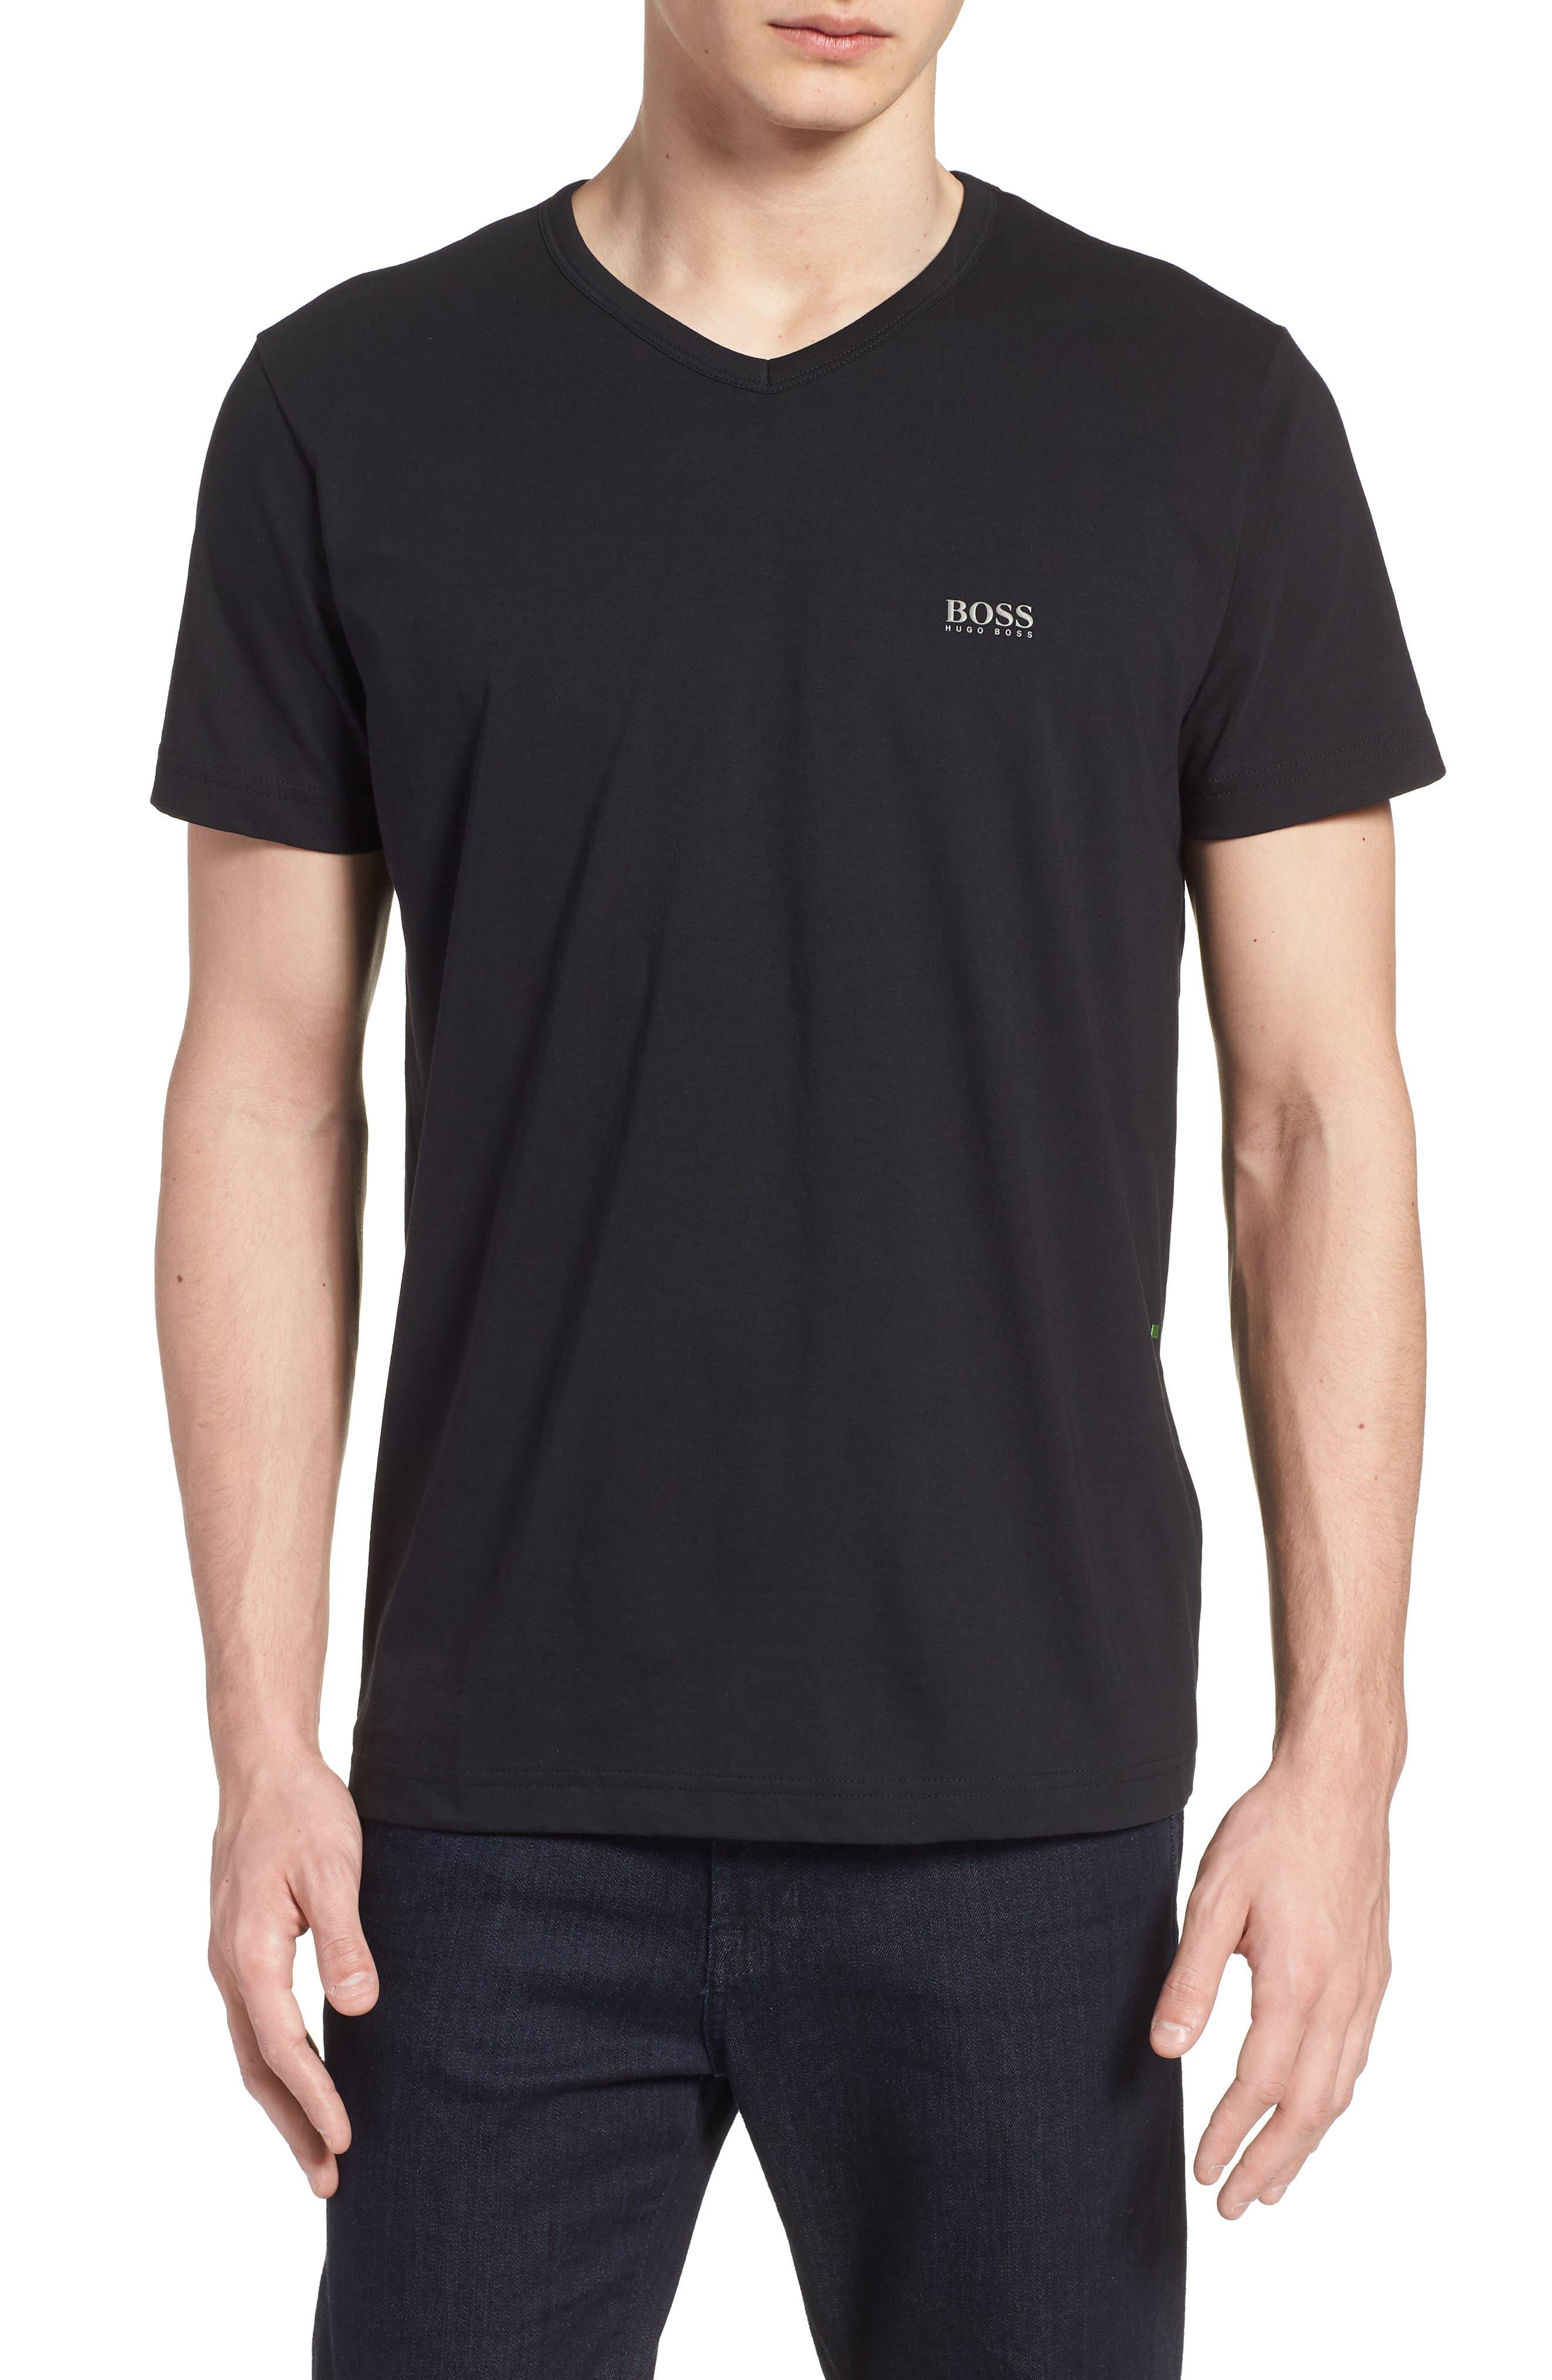 Teevn Regular Fit V-Neck T-Shirt,                         Main,                         color, Black